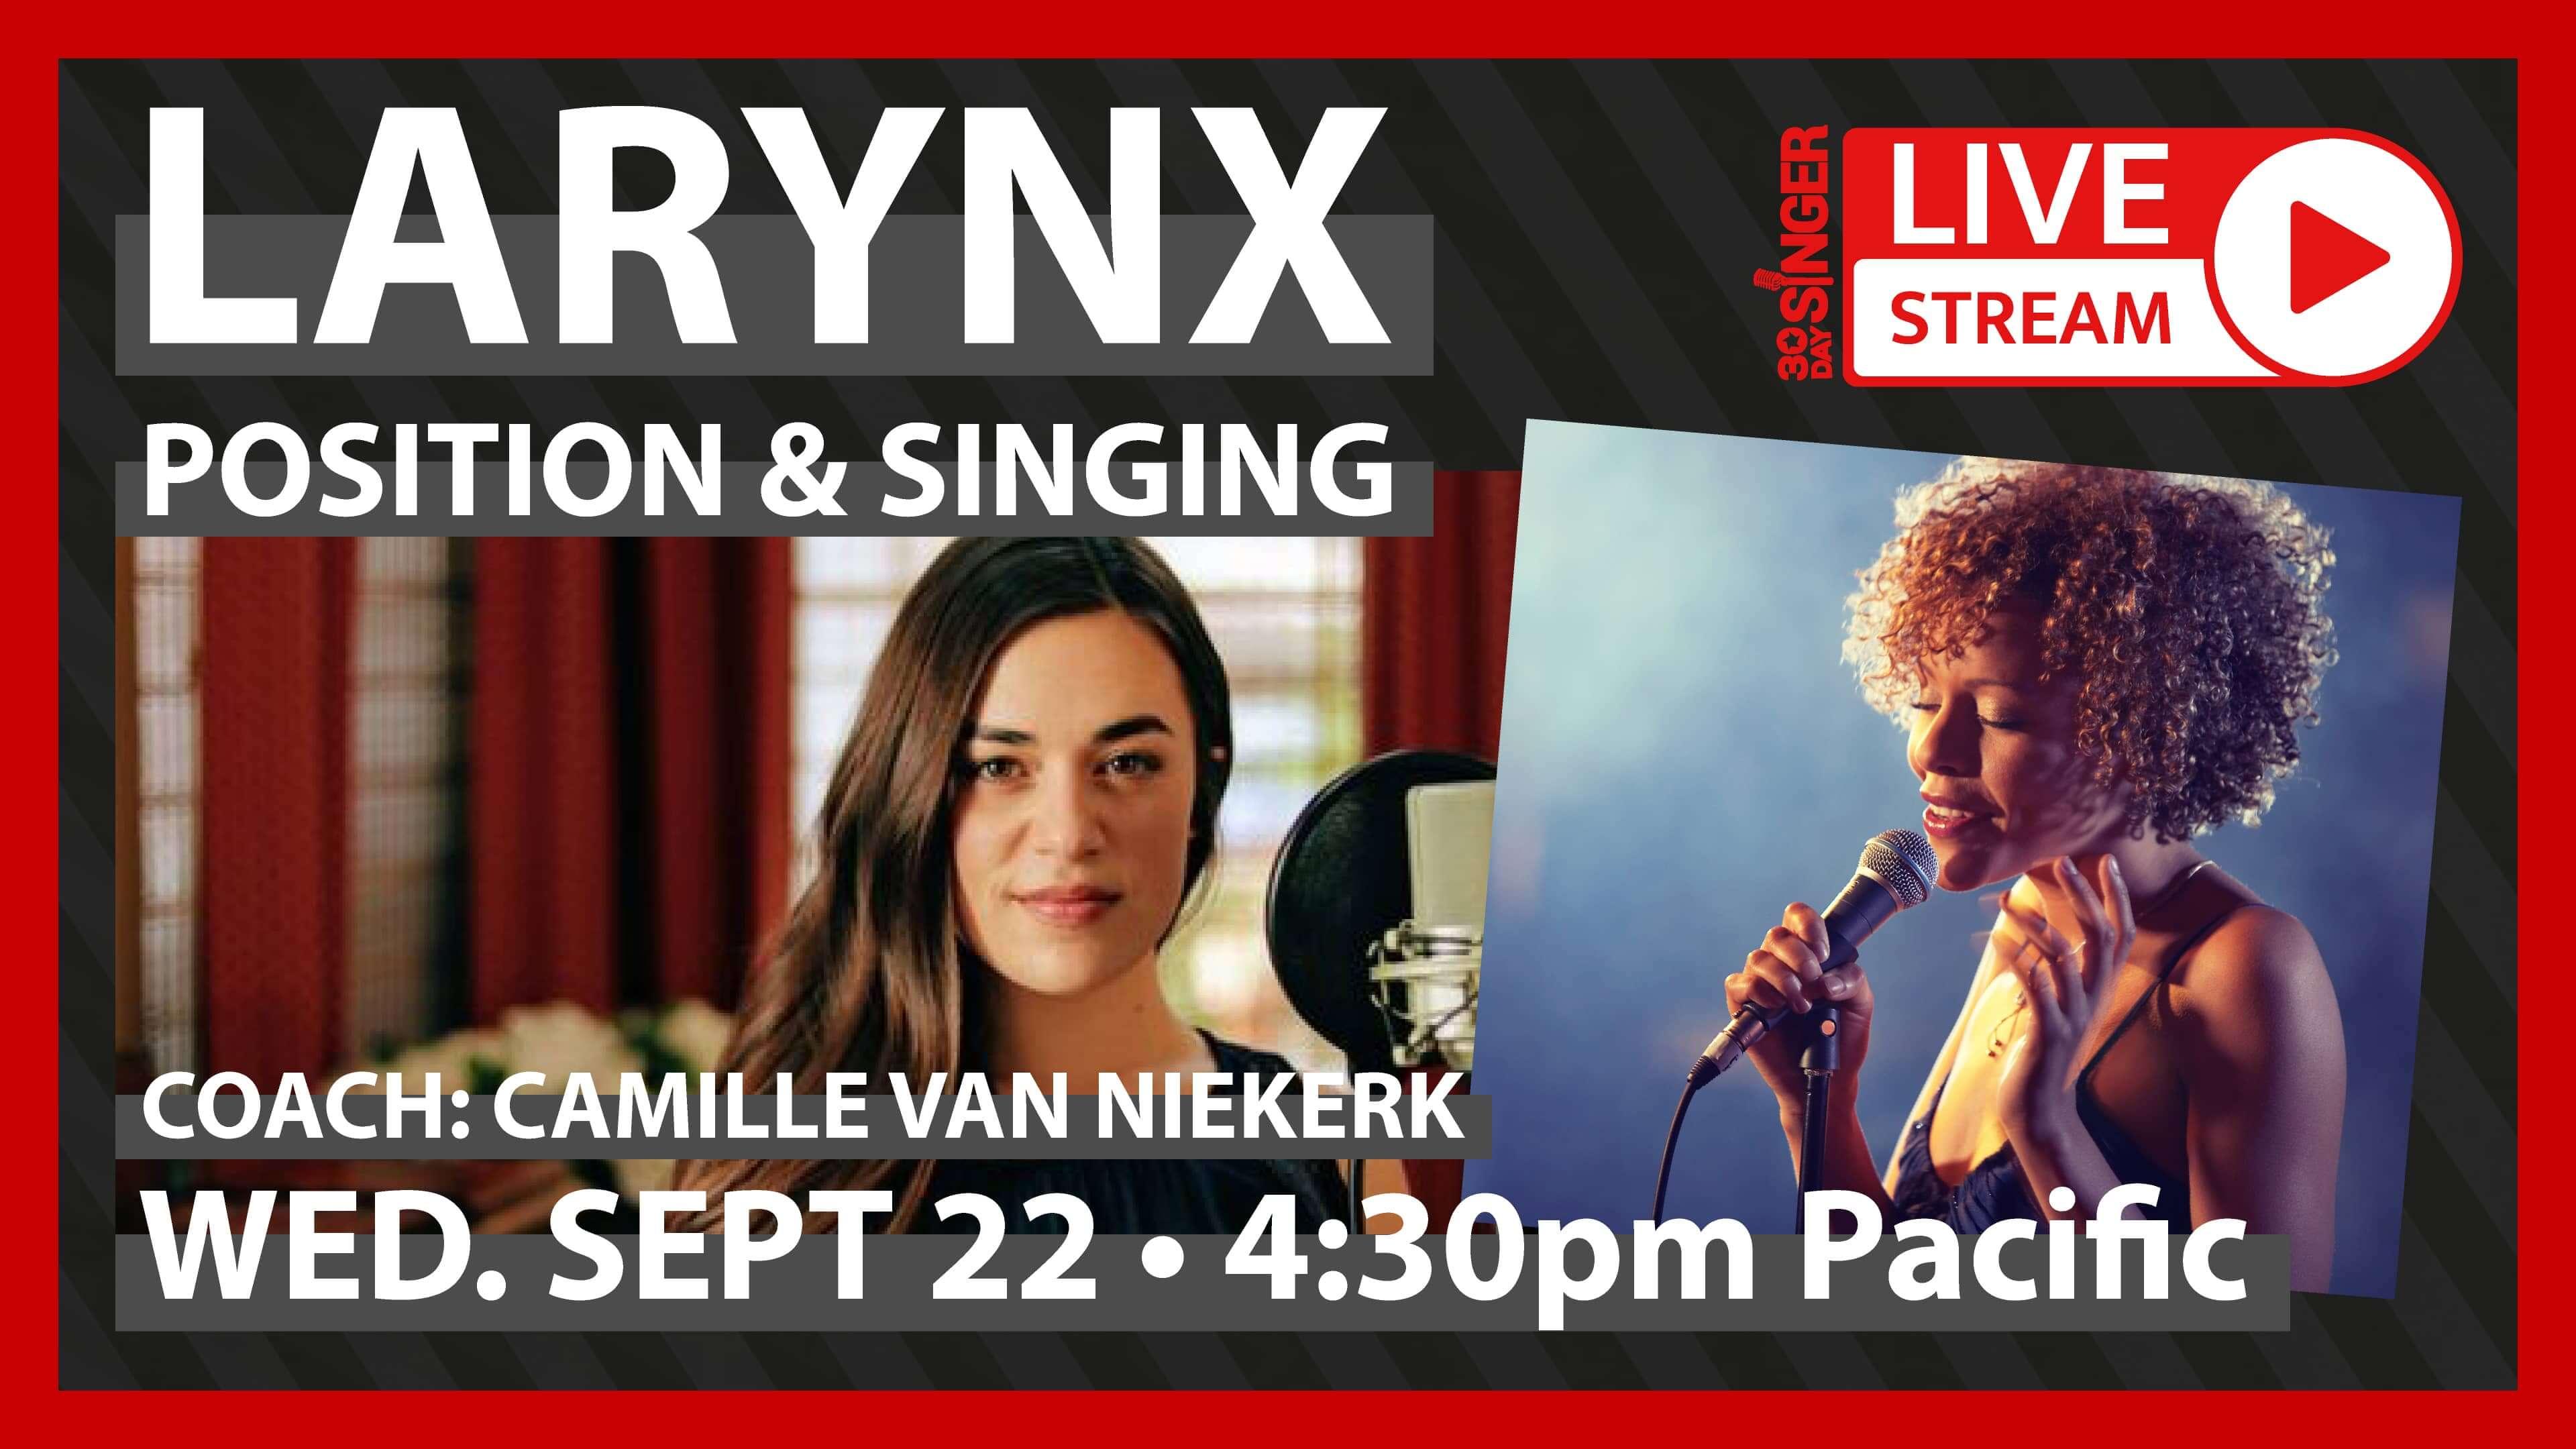 Larynx Position & Singing